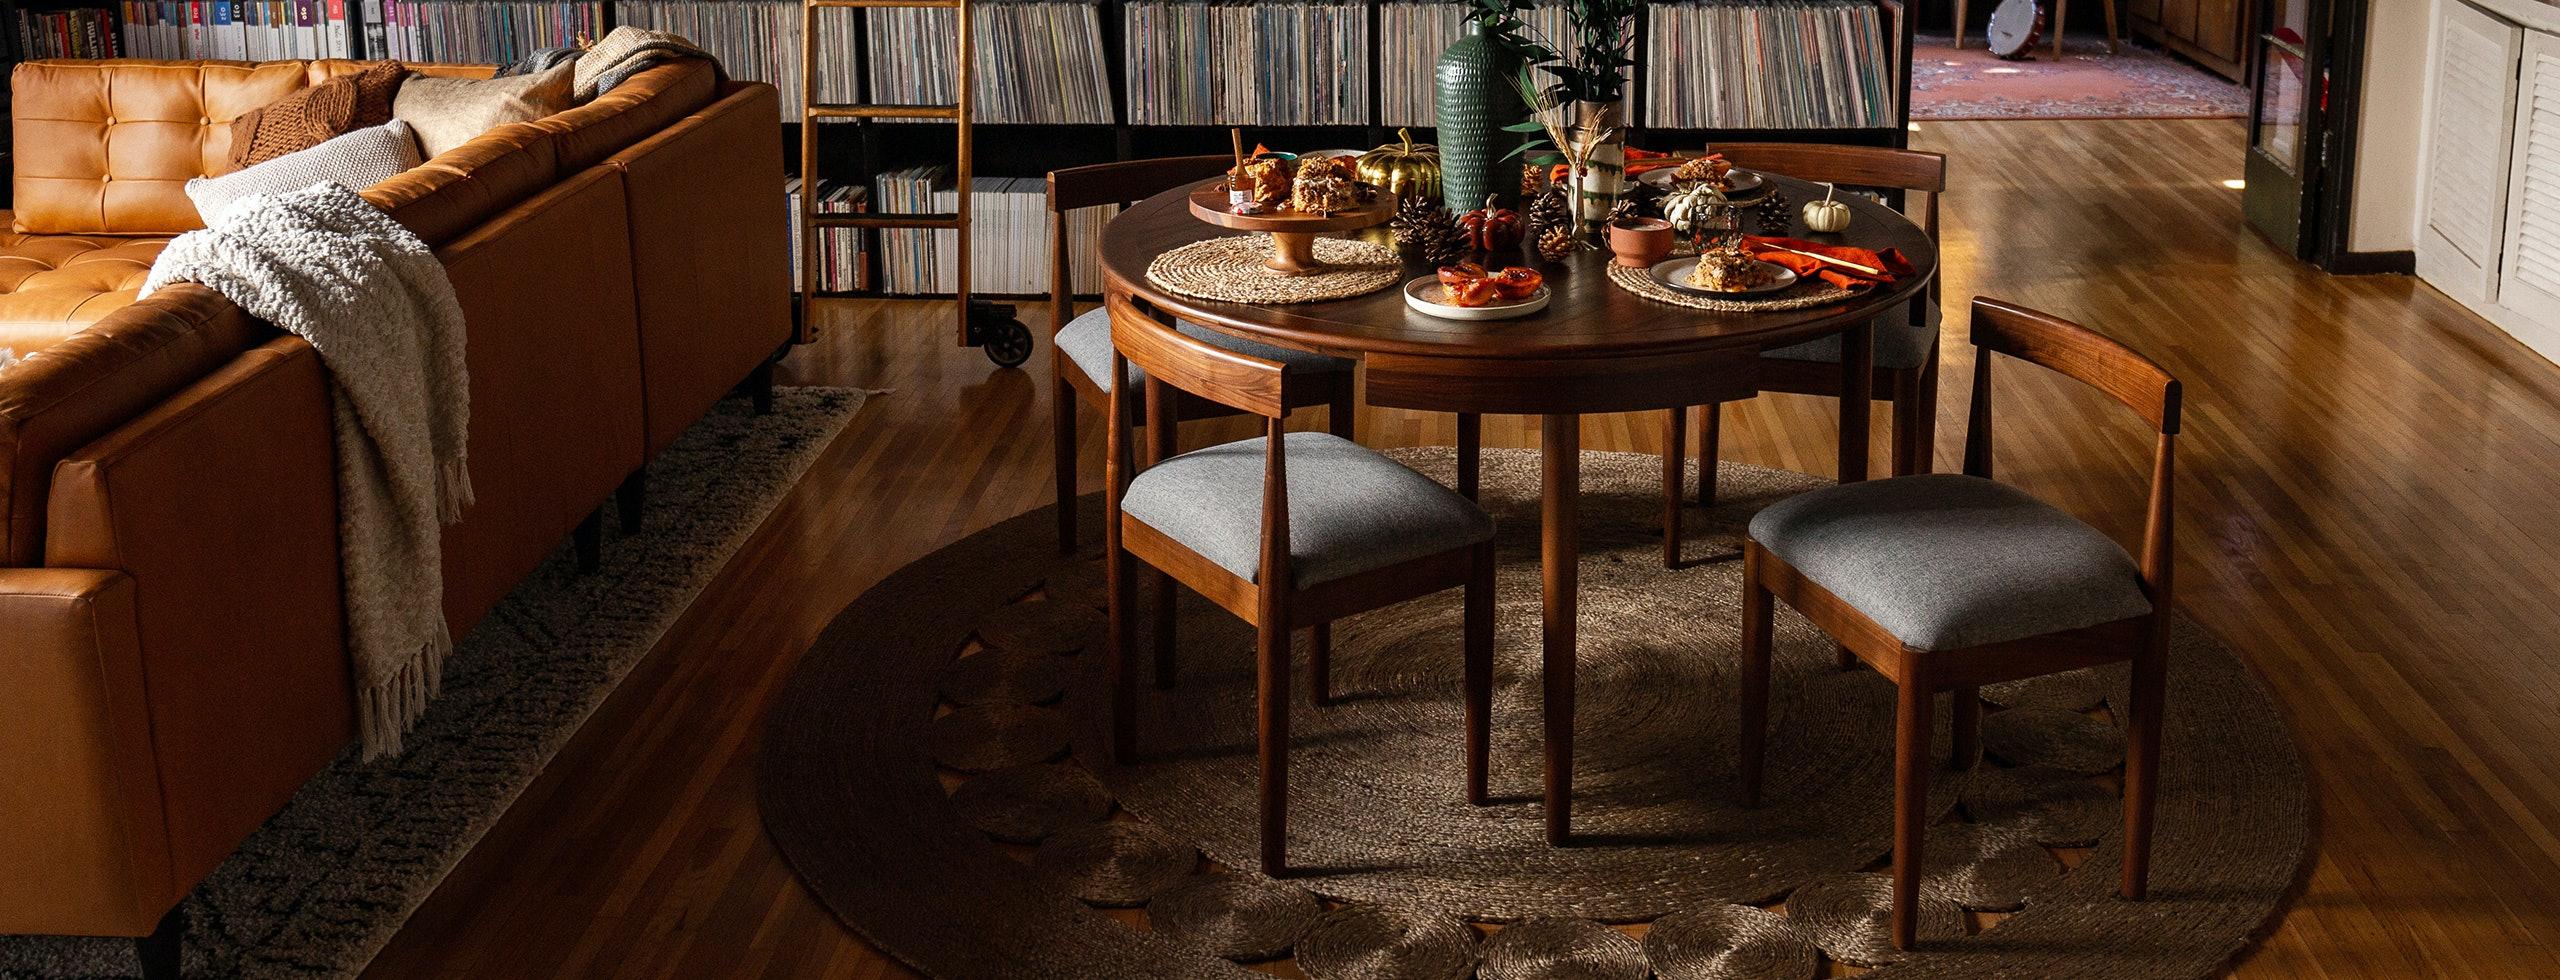 Holiday Record Room Toscano Dining Table Taylor Felt Grey